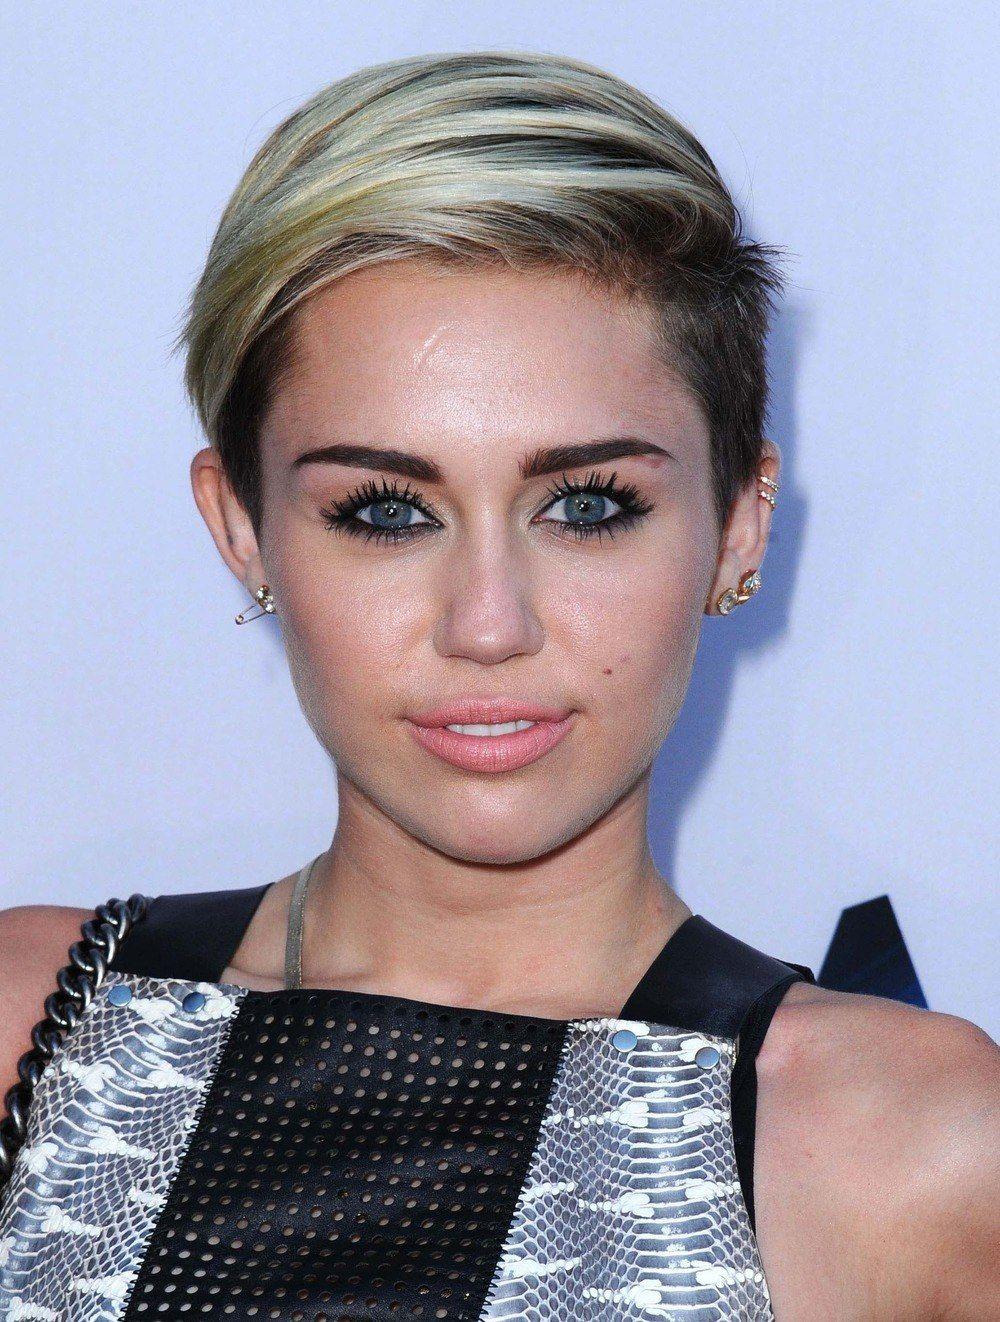 Miley Cyrus Short Hair Google Search Short Hair Pinterest